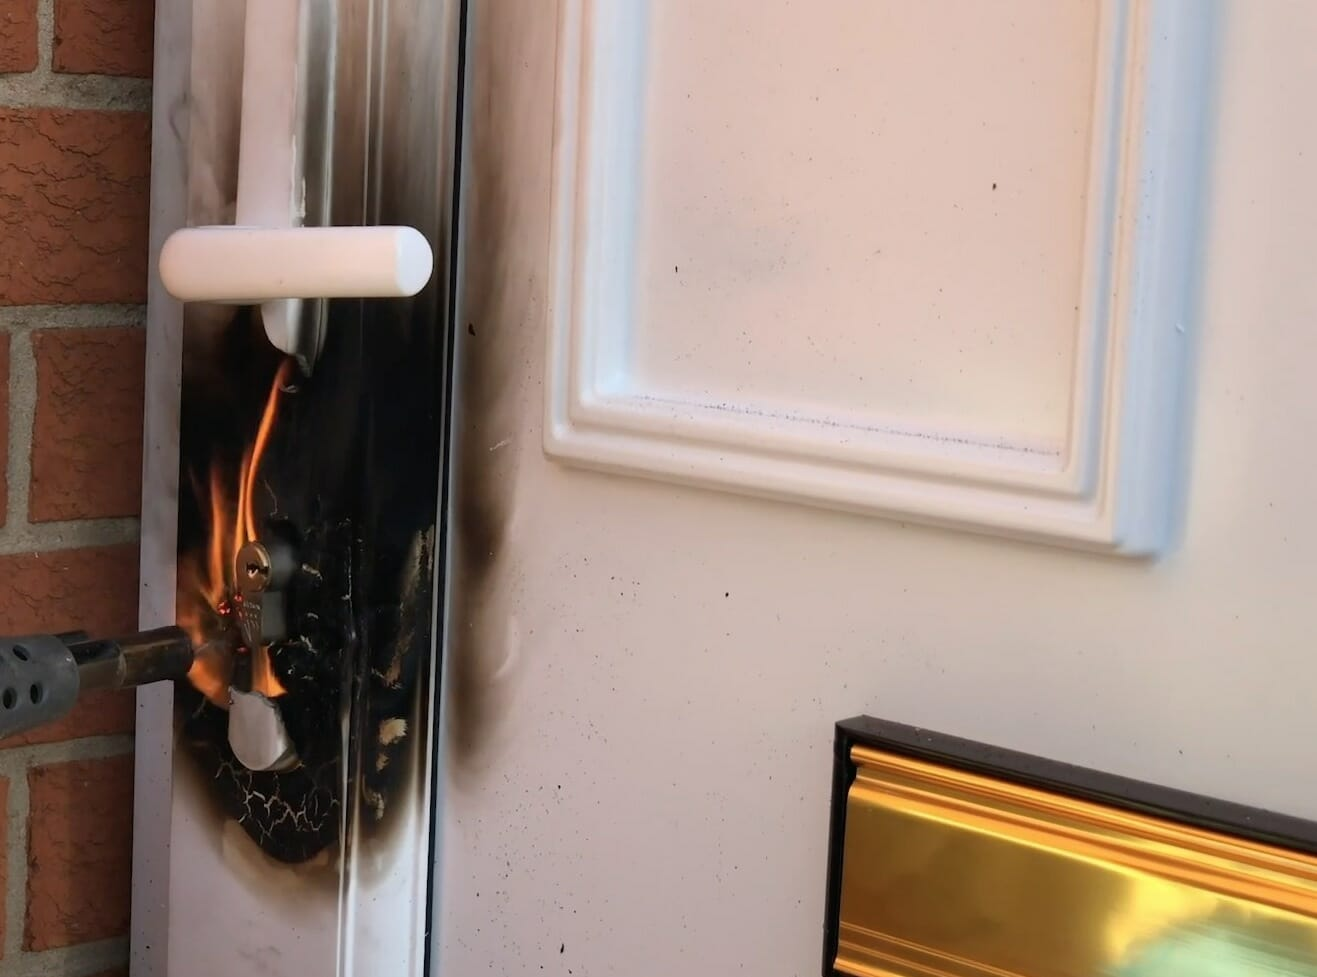 Blowtorch Burglarly on door